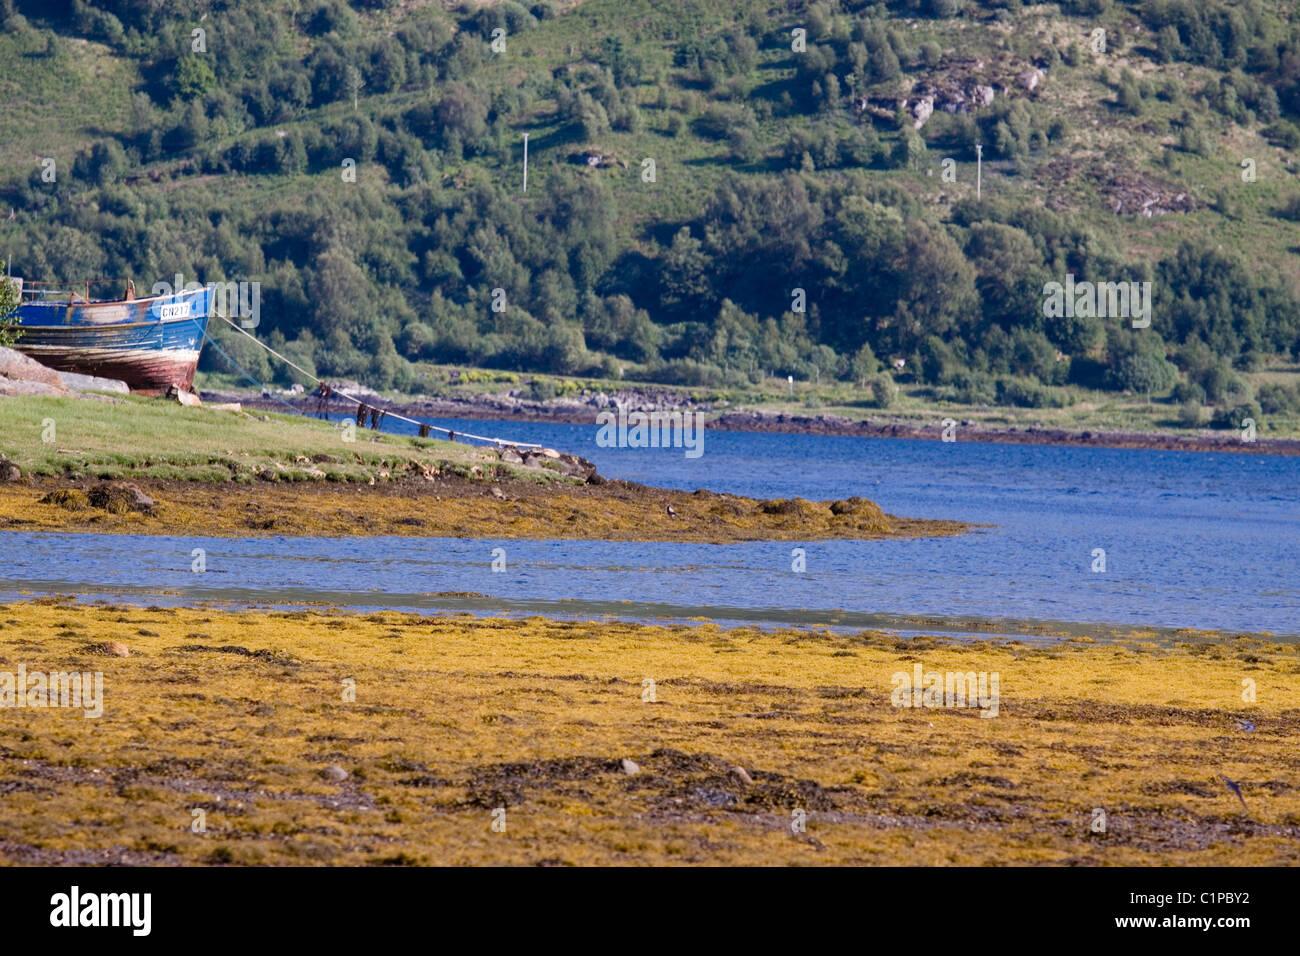 Scotland, Strontian, fishing boat moored on shoreline - Stock Image